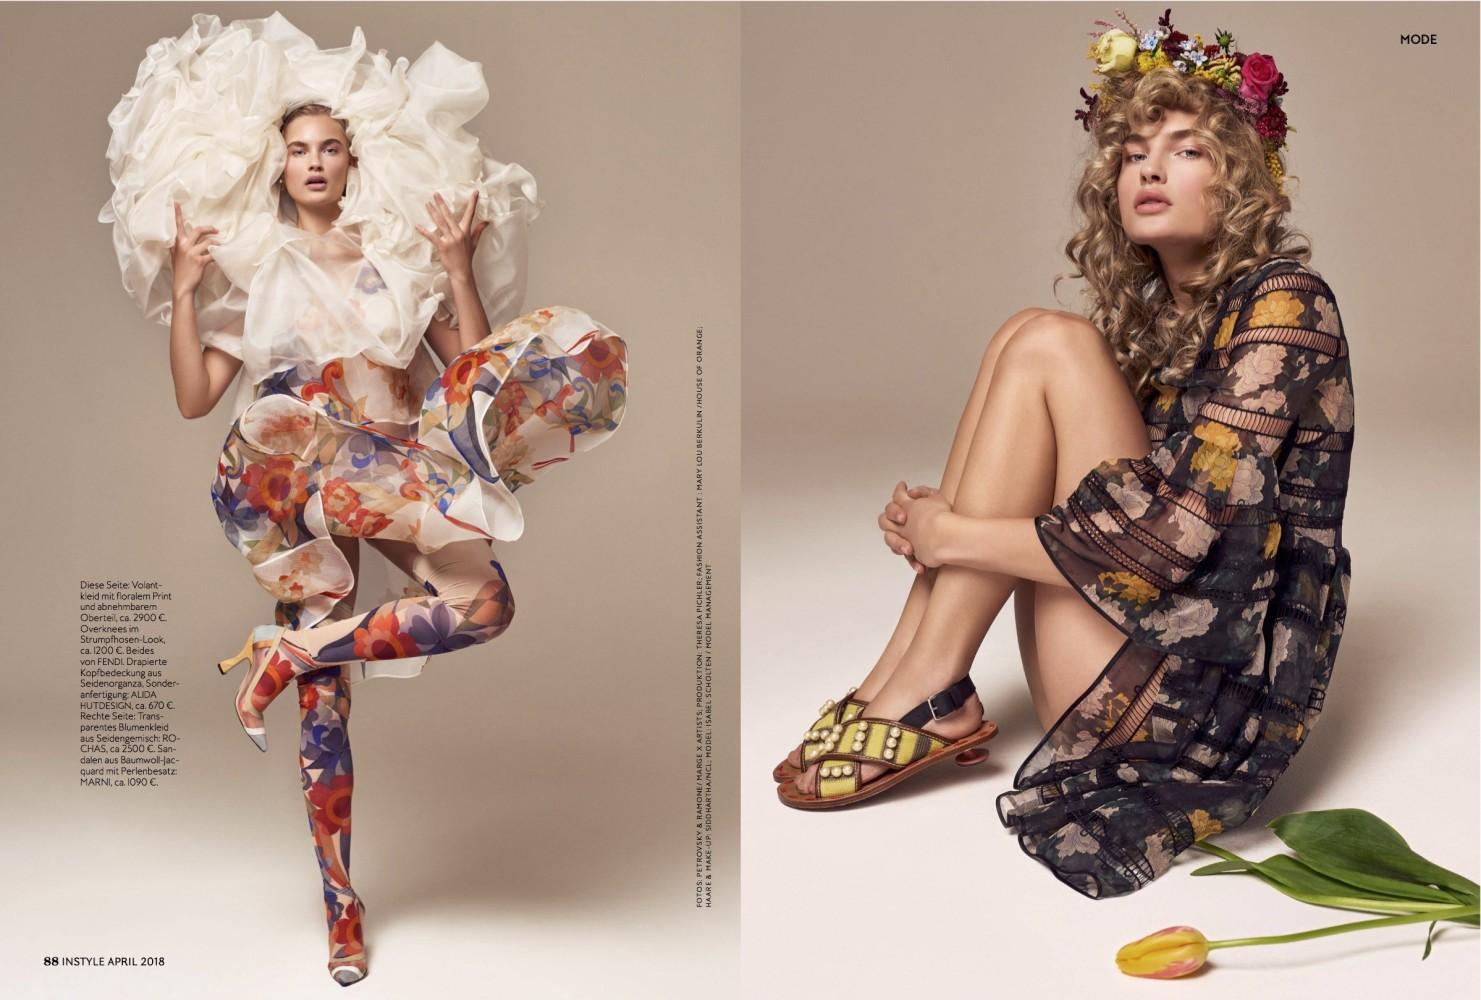 Isabel for Instyle Magazine